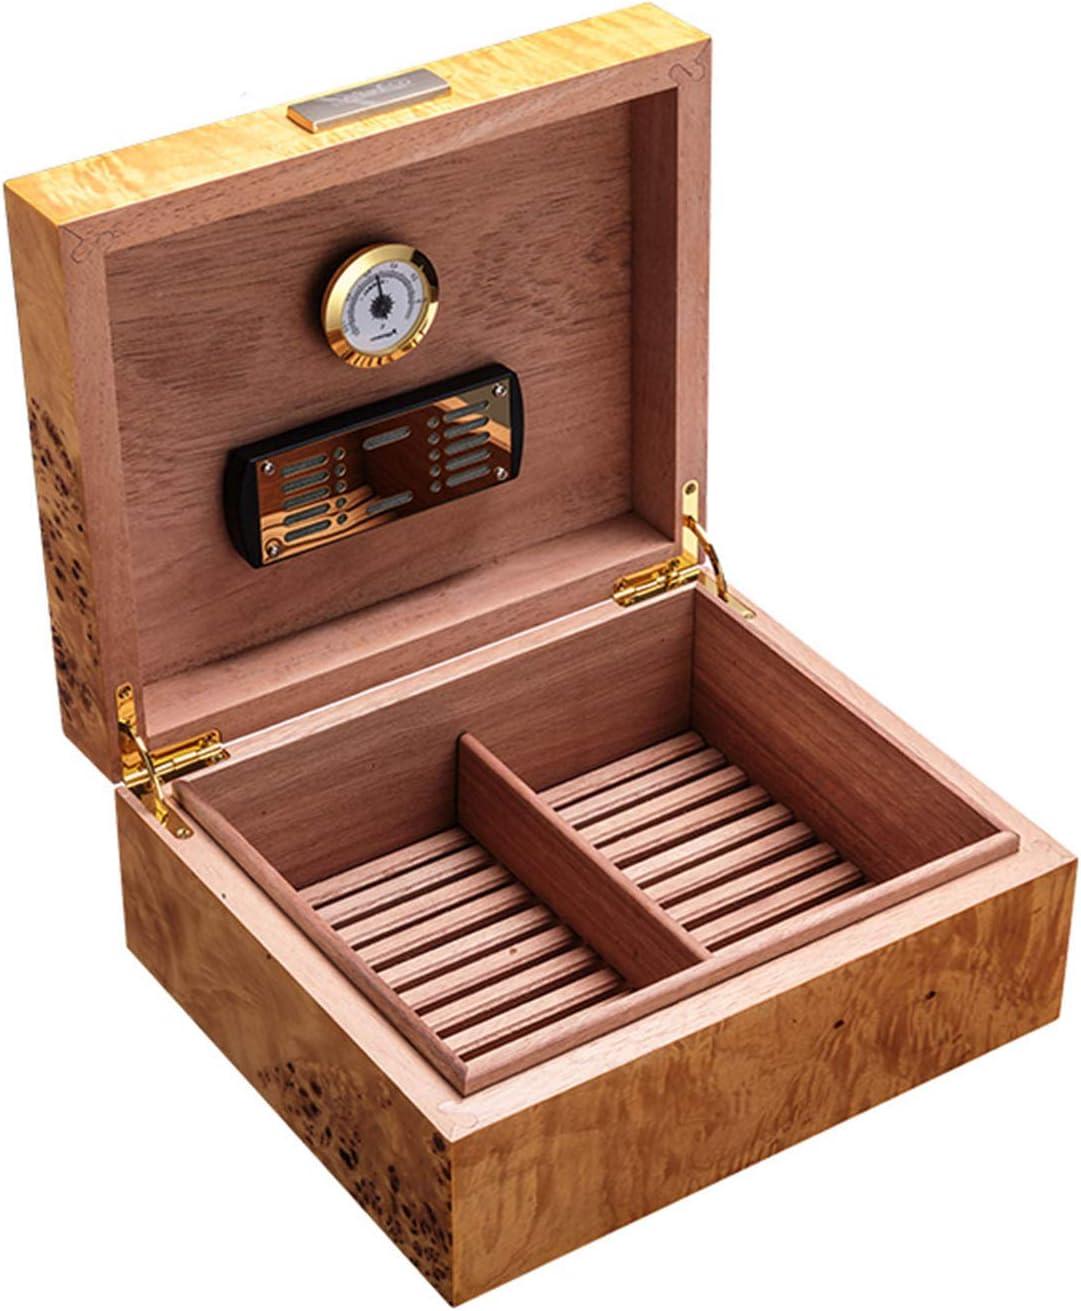 Wood Cigar Box Boston Mall Desktop Hygrometer with store Humidor and